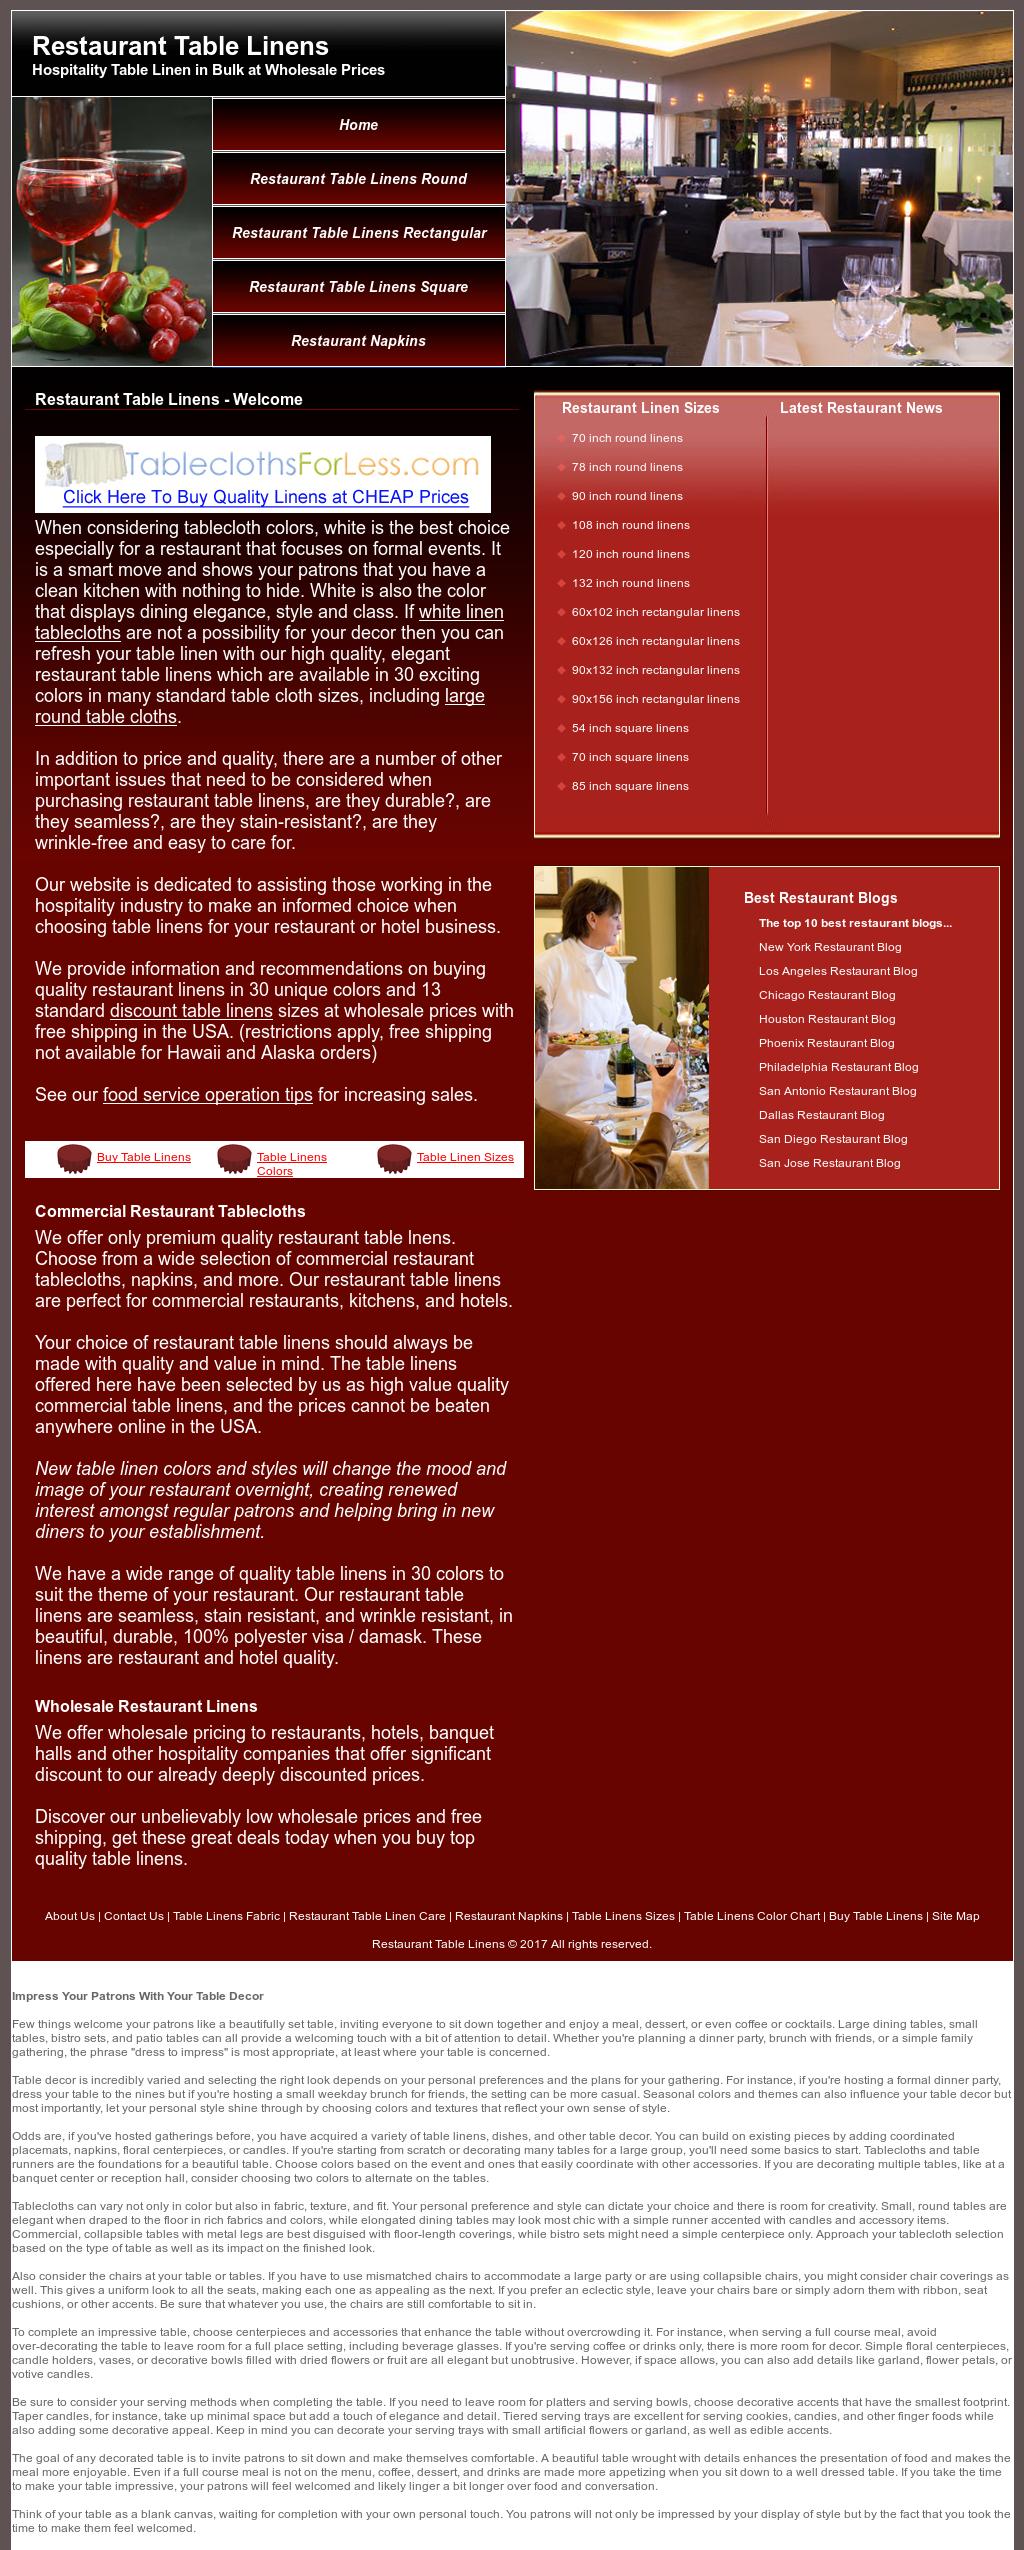 Restaurant Table Linens Website History